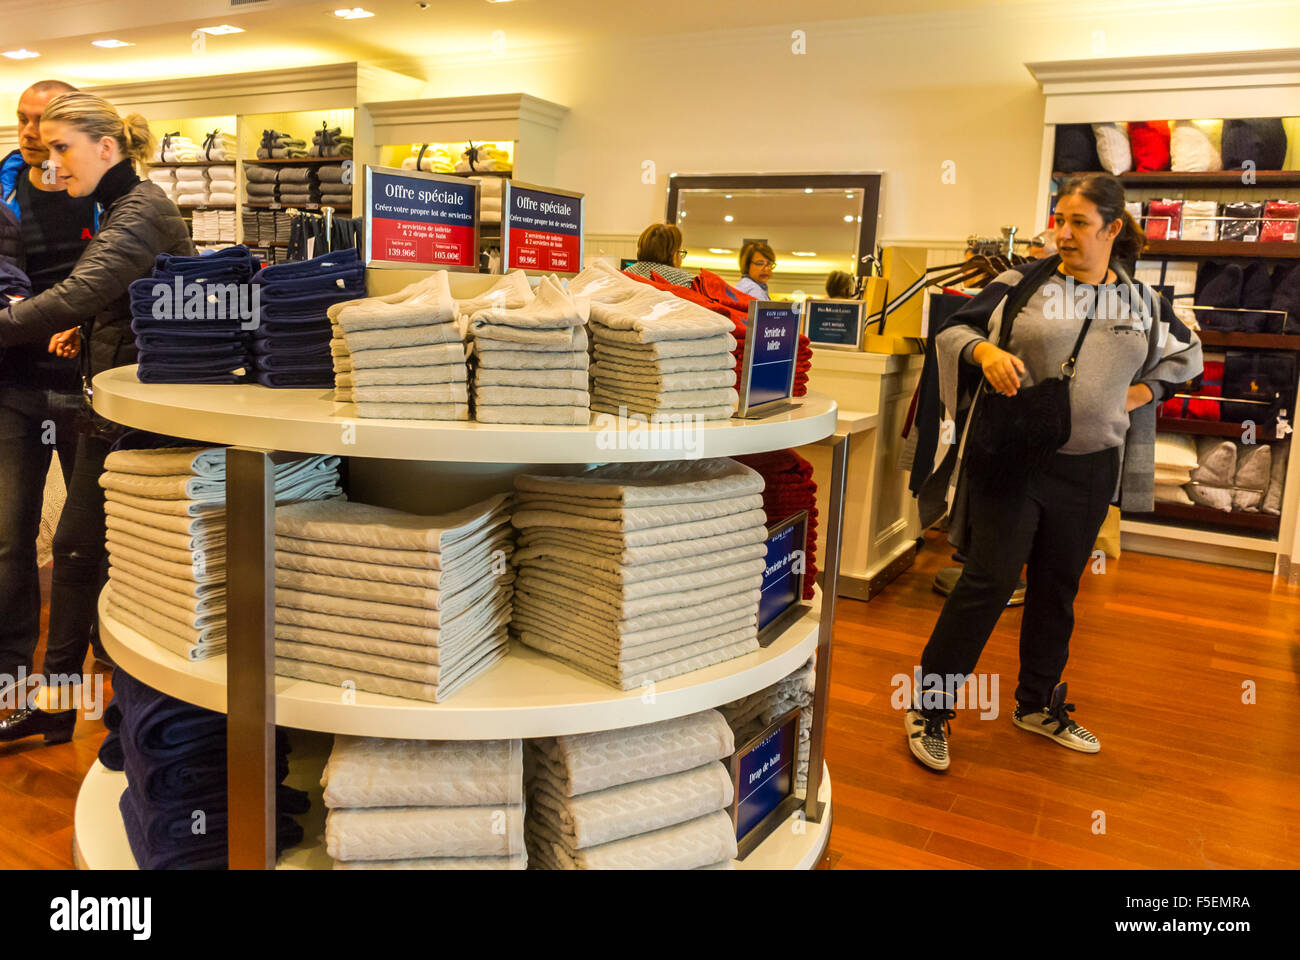 Paris, France, Women Shopping Luxury Stores in \u0026quot;La Vallee Village\u0026quot;, Discount Shops, \u0026quot;Ralph Lauren Home\u0026quot; Store, inside